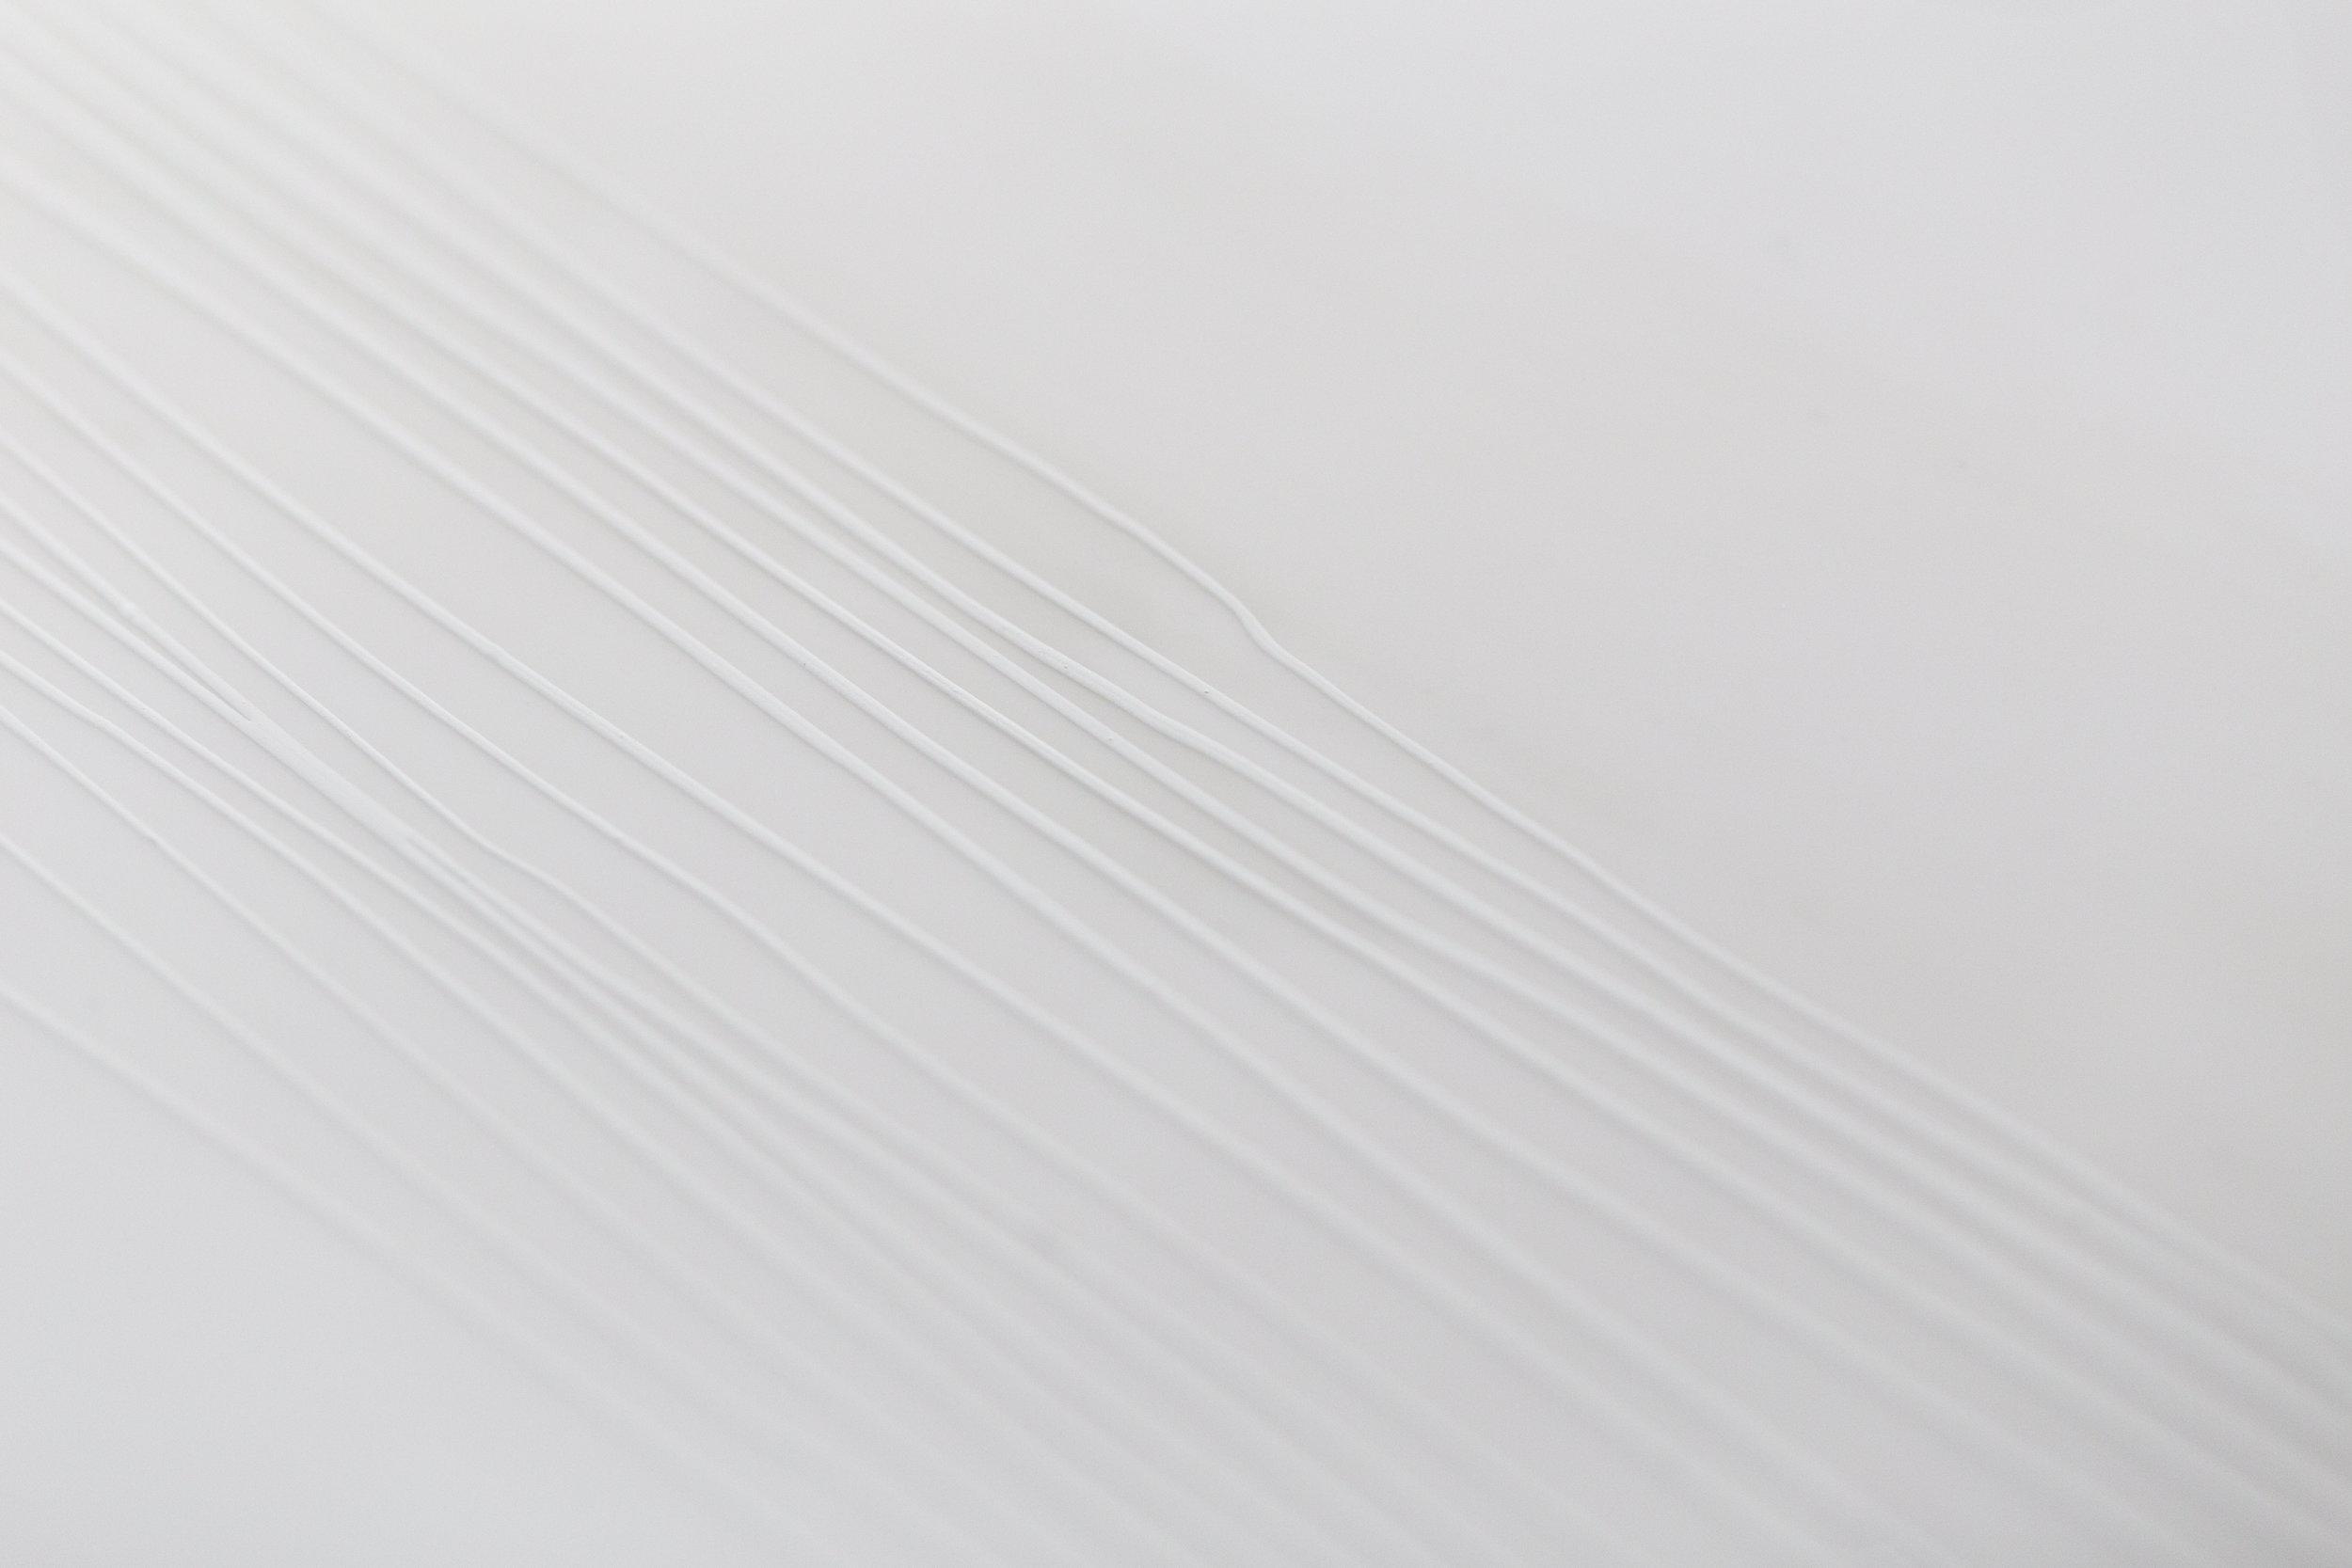 LulaJapan-6.jpg